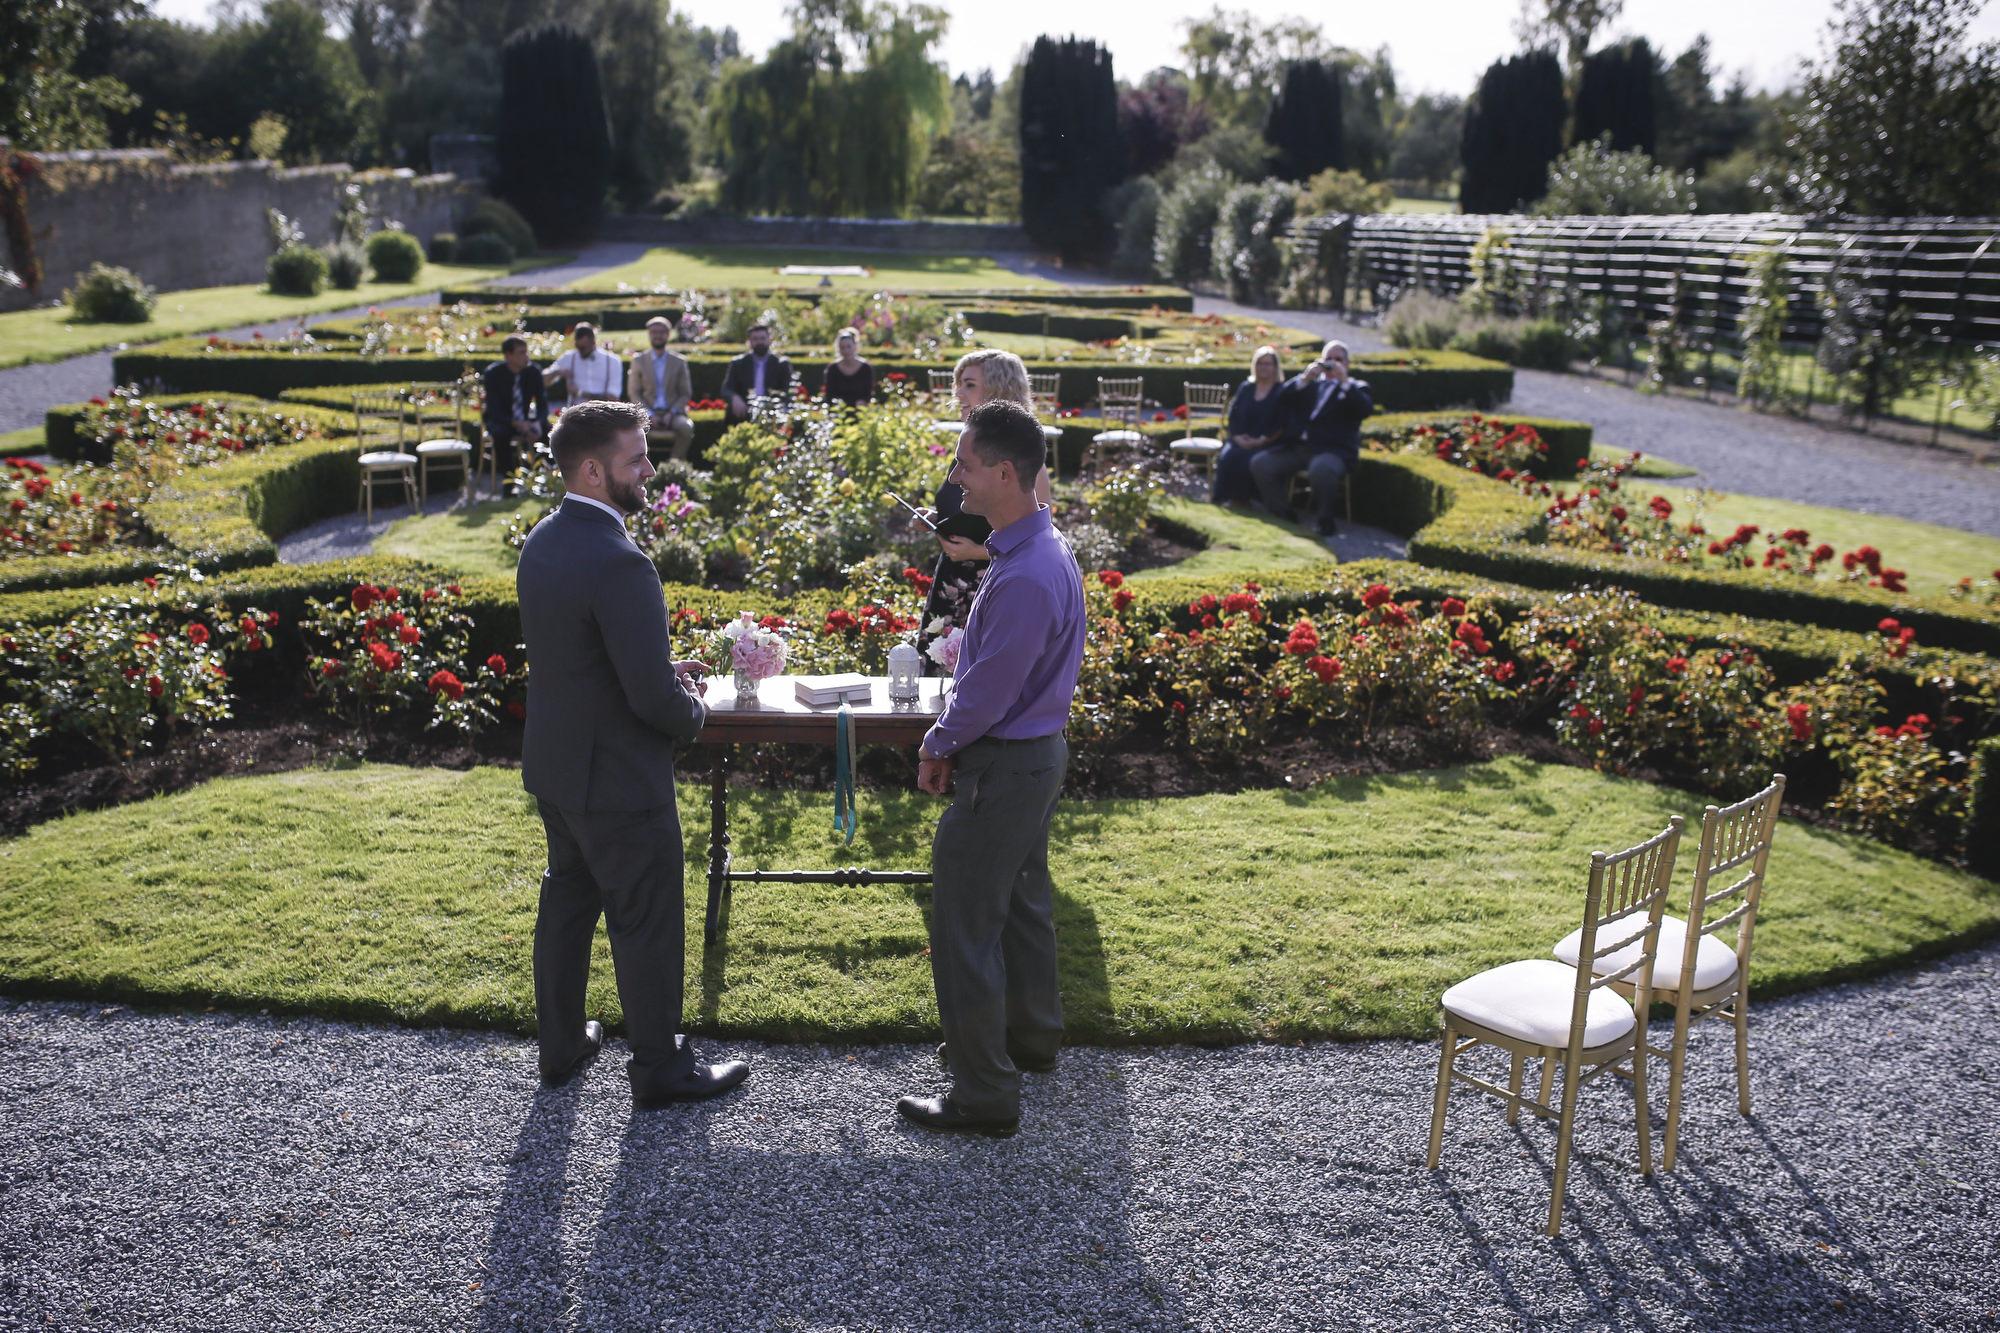 kilkea_castle_wedding_photographer_goldenmoments_012.jpg